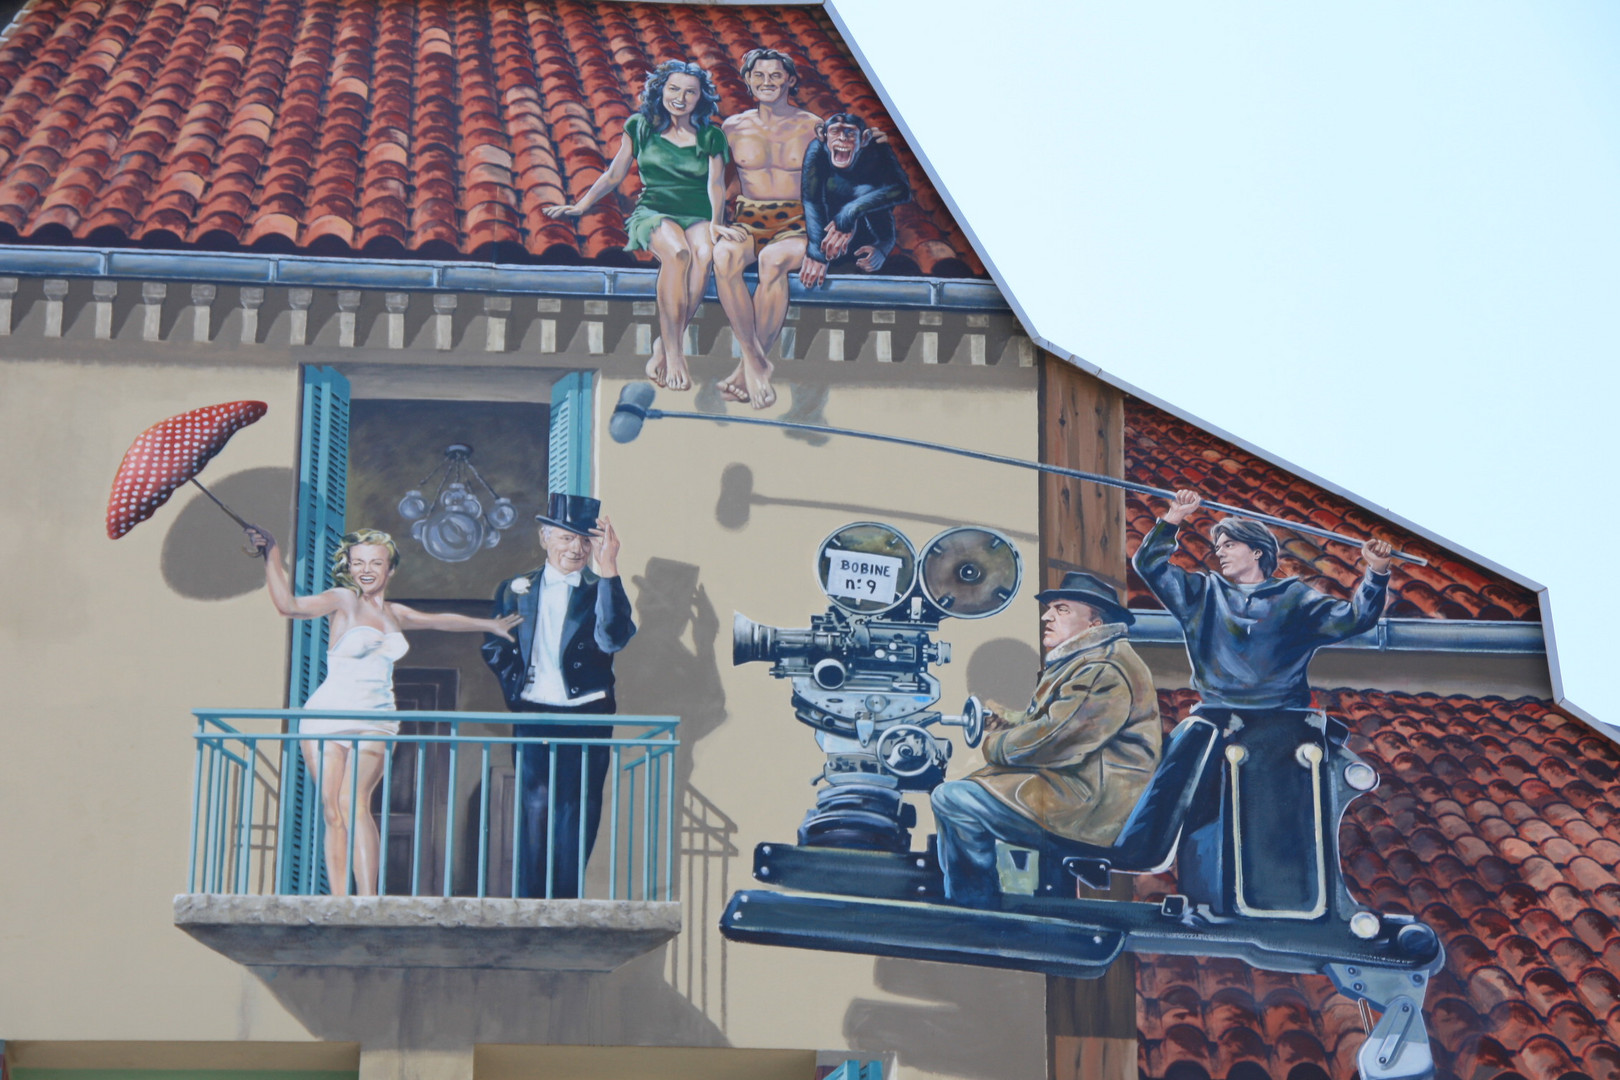 Graffiti - Aufnahme